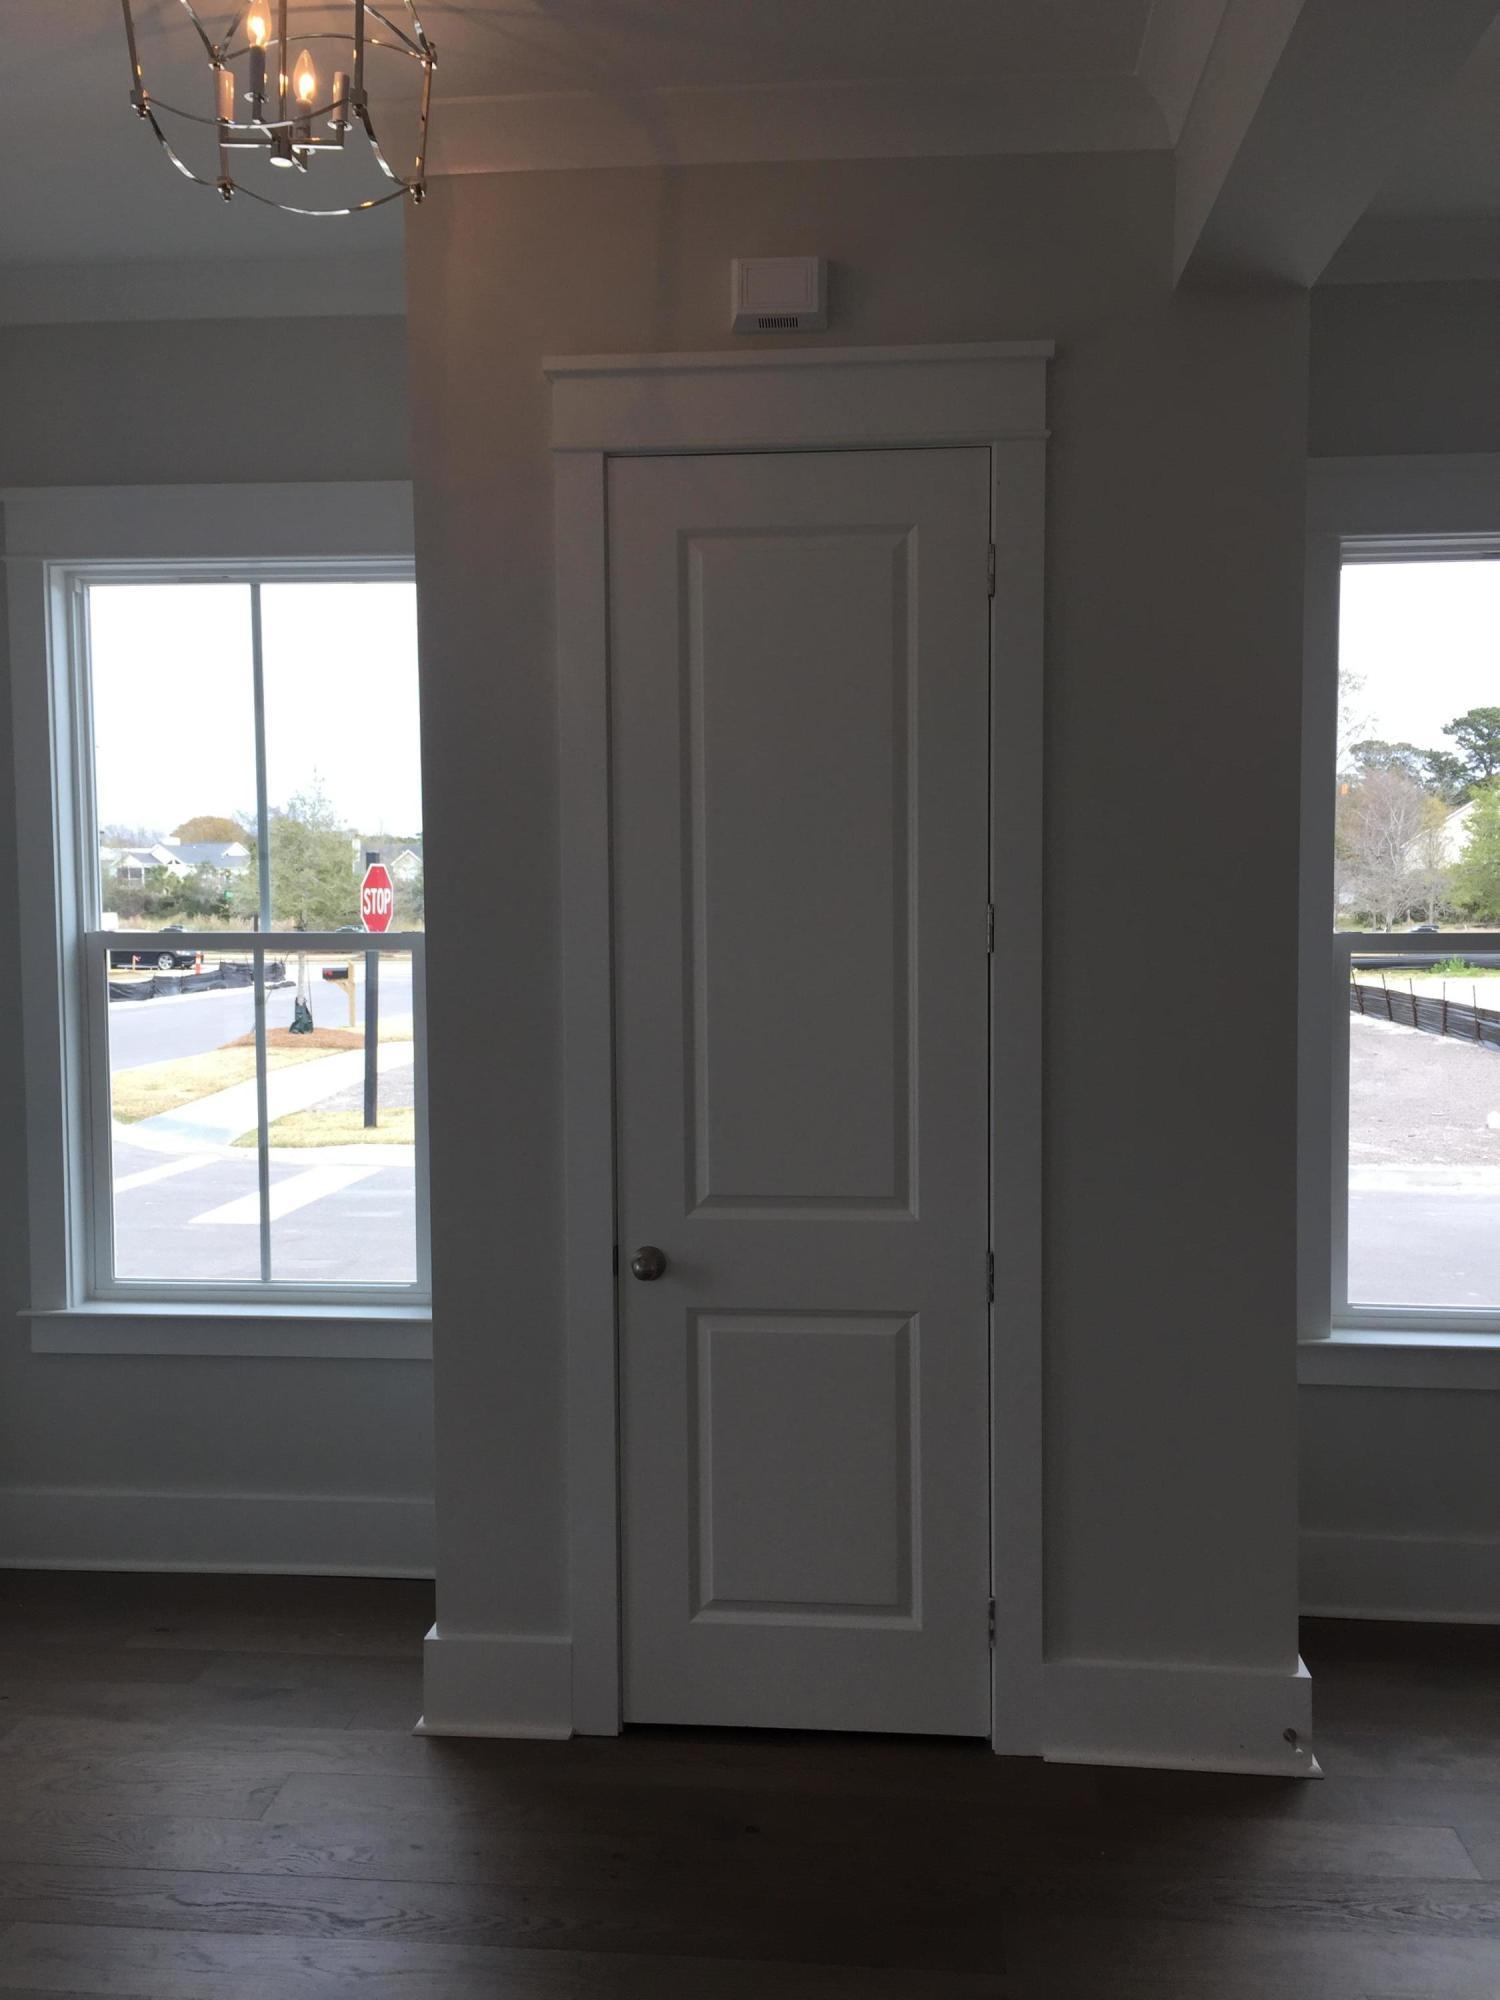 Midtown Homes For Sale - 1525 Kepley S., Mount Pleasant, SC - 78